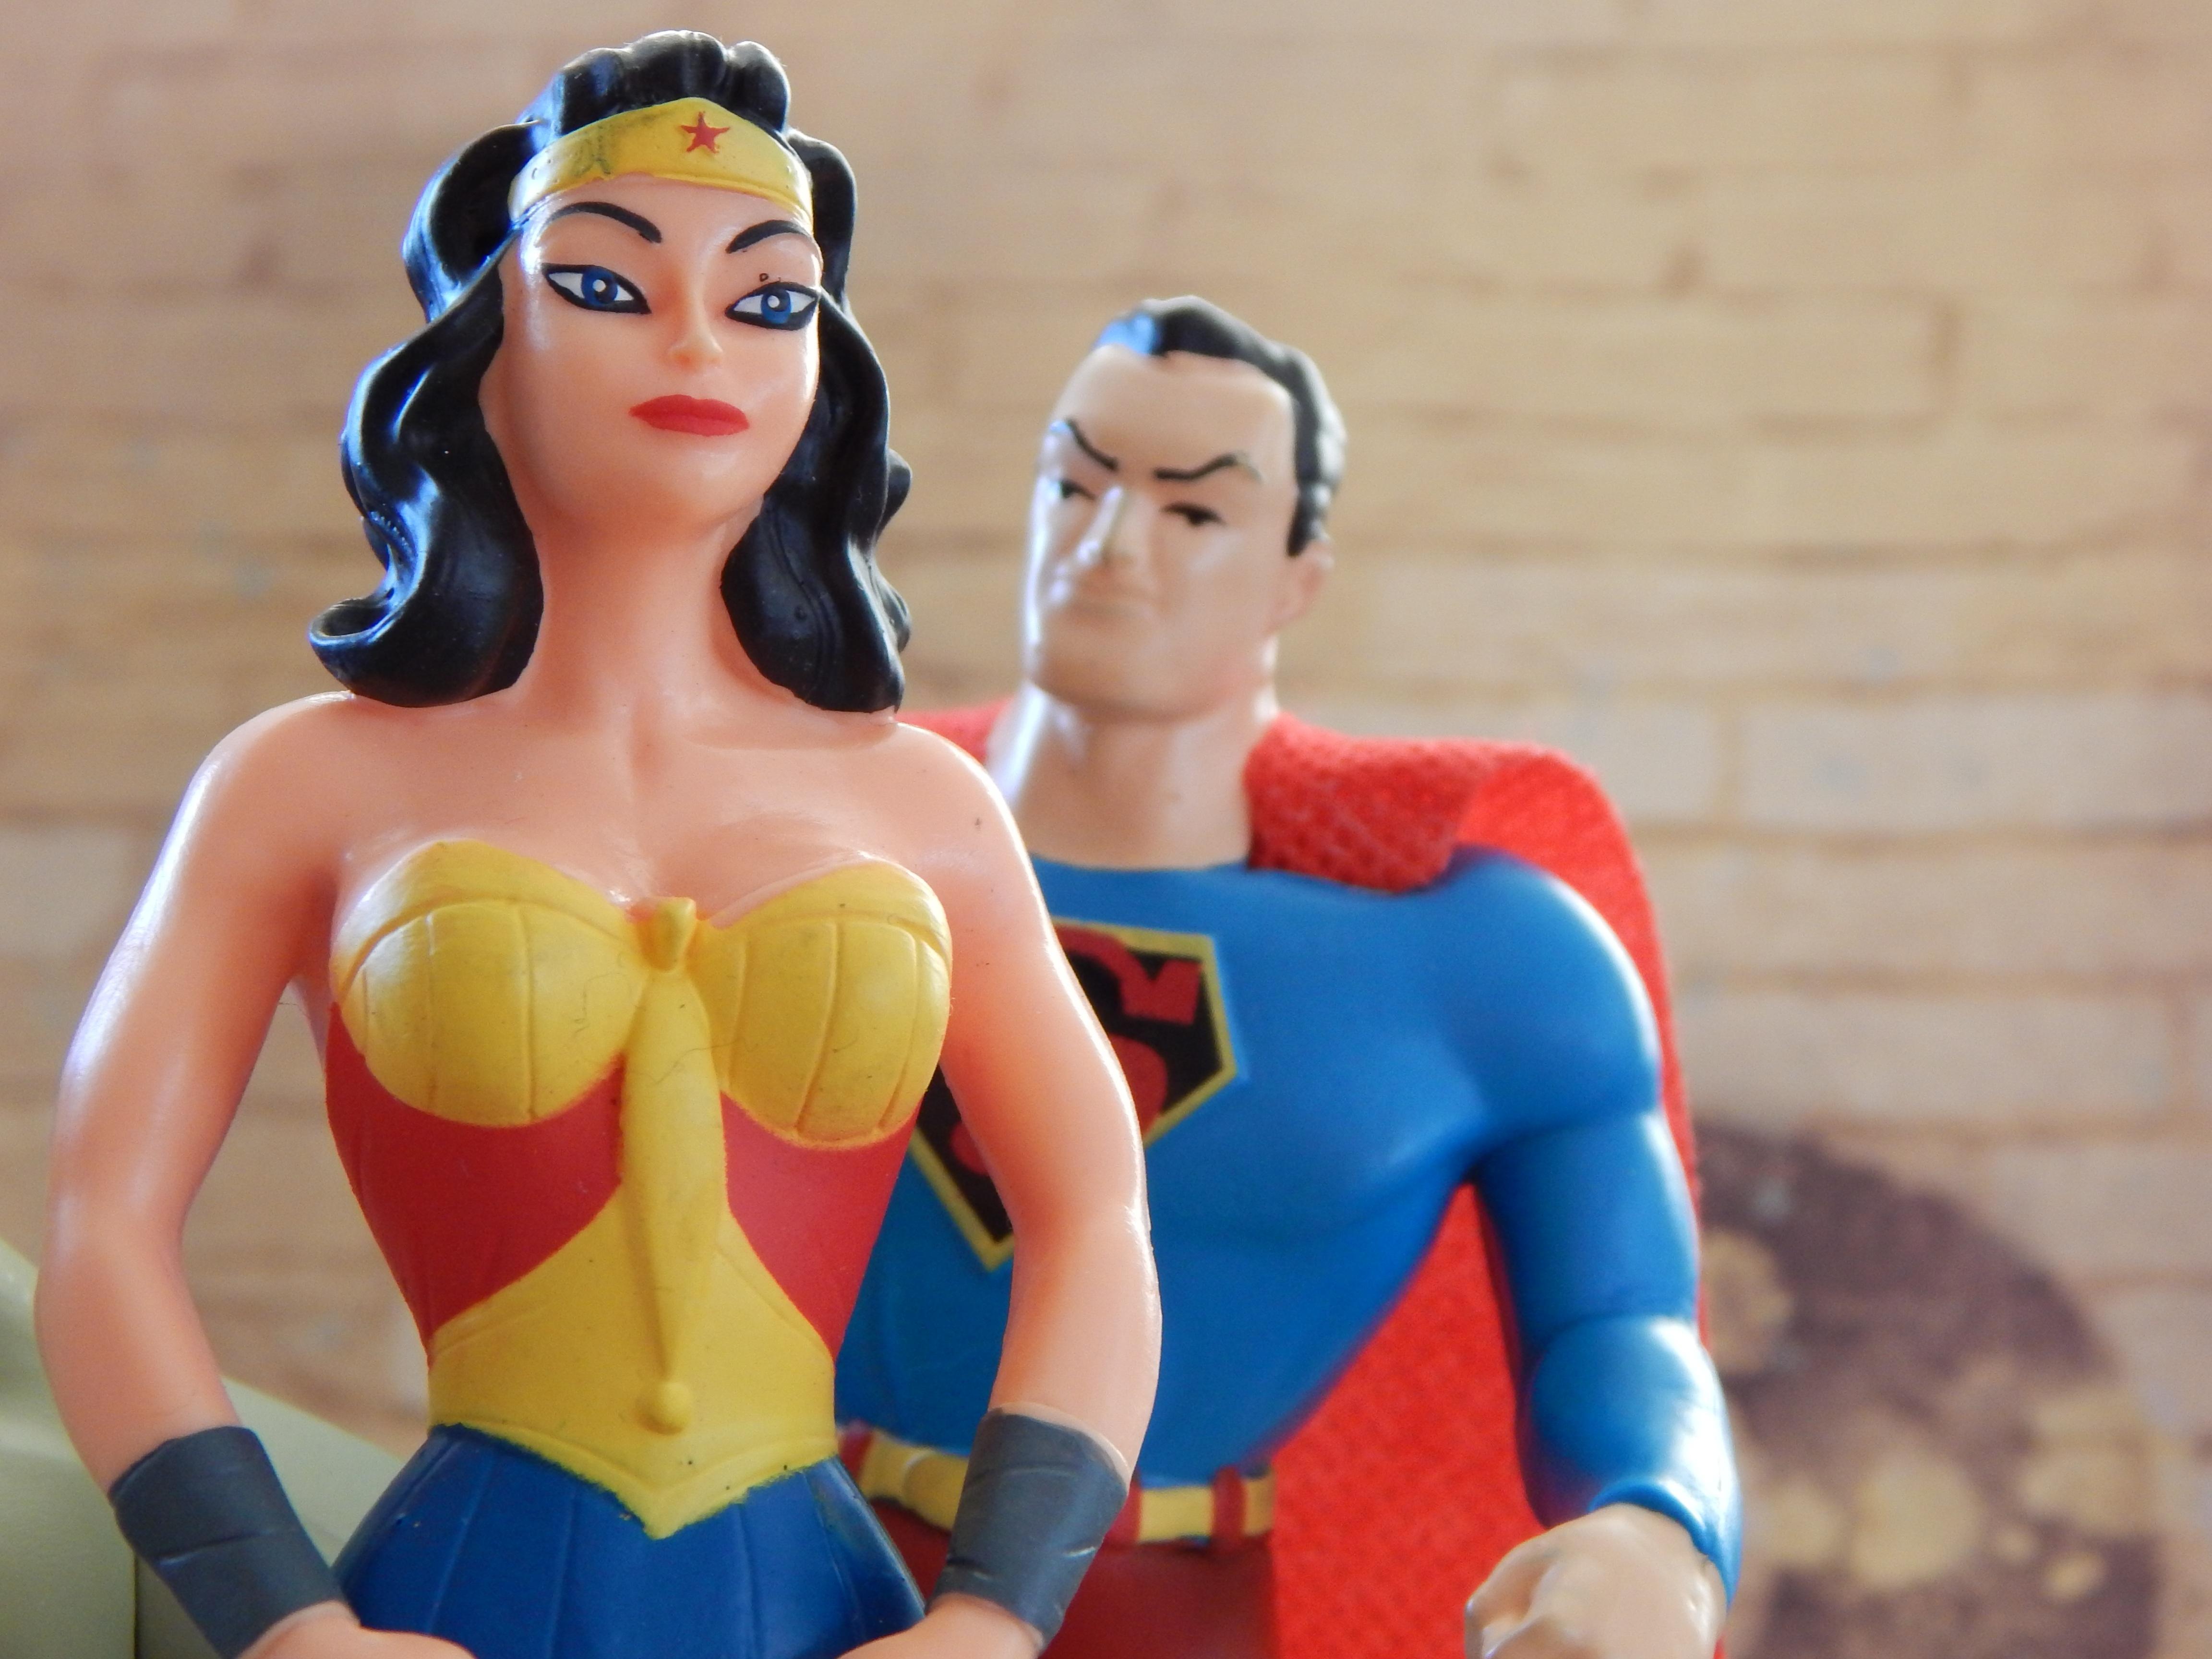 gambar wanita pria mainan kekuasaan arca super menyamarkan